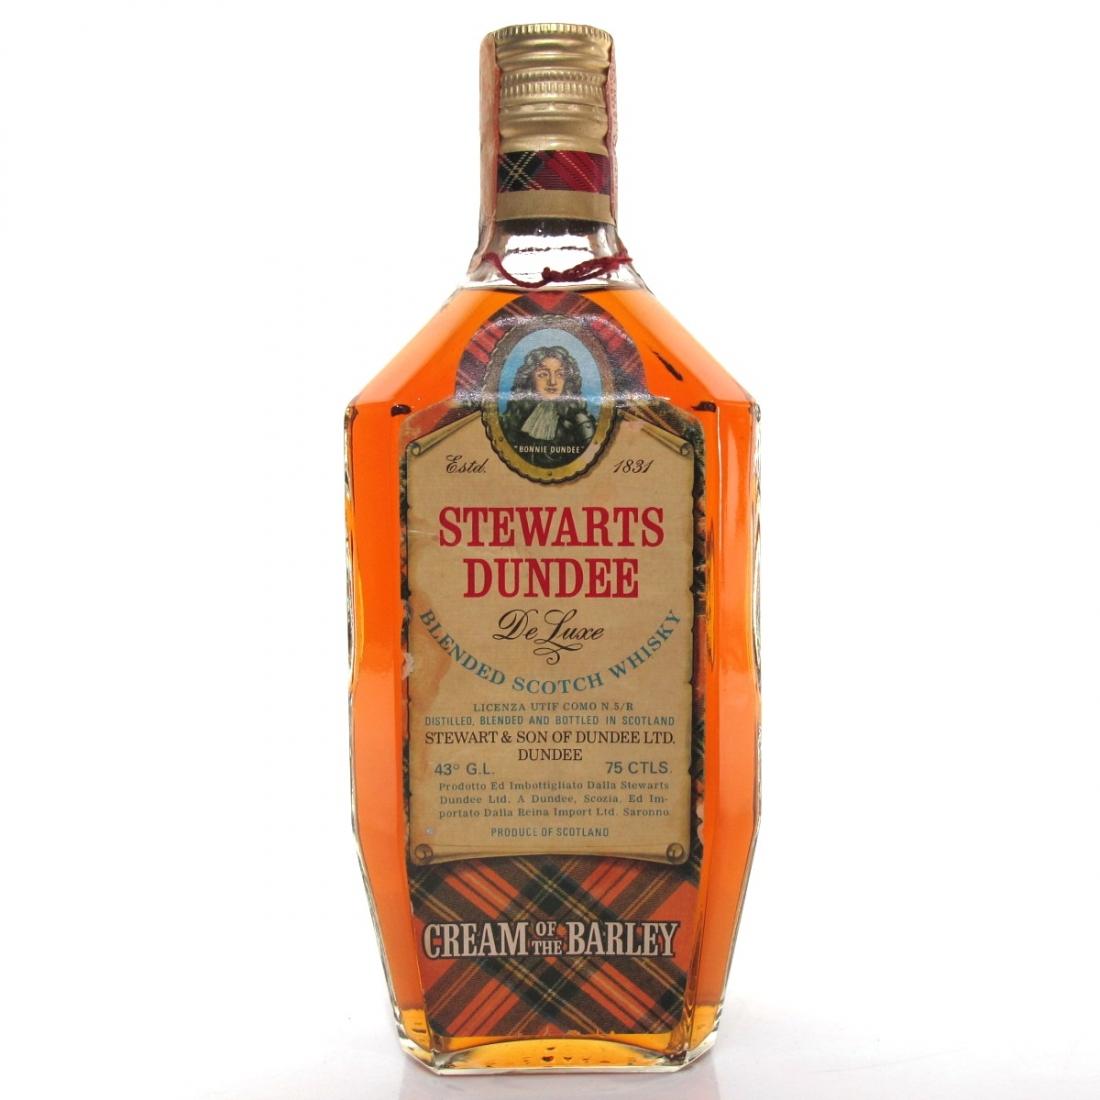 Stewarts Dundee Cream of the Barley 1970s / Reina Import